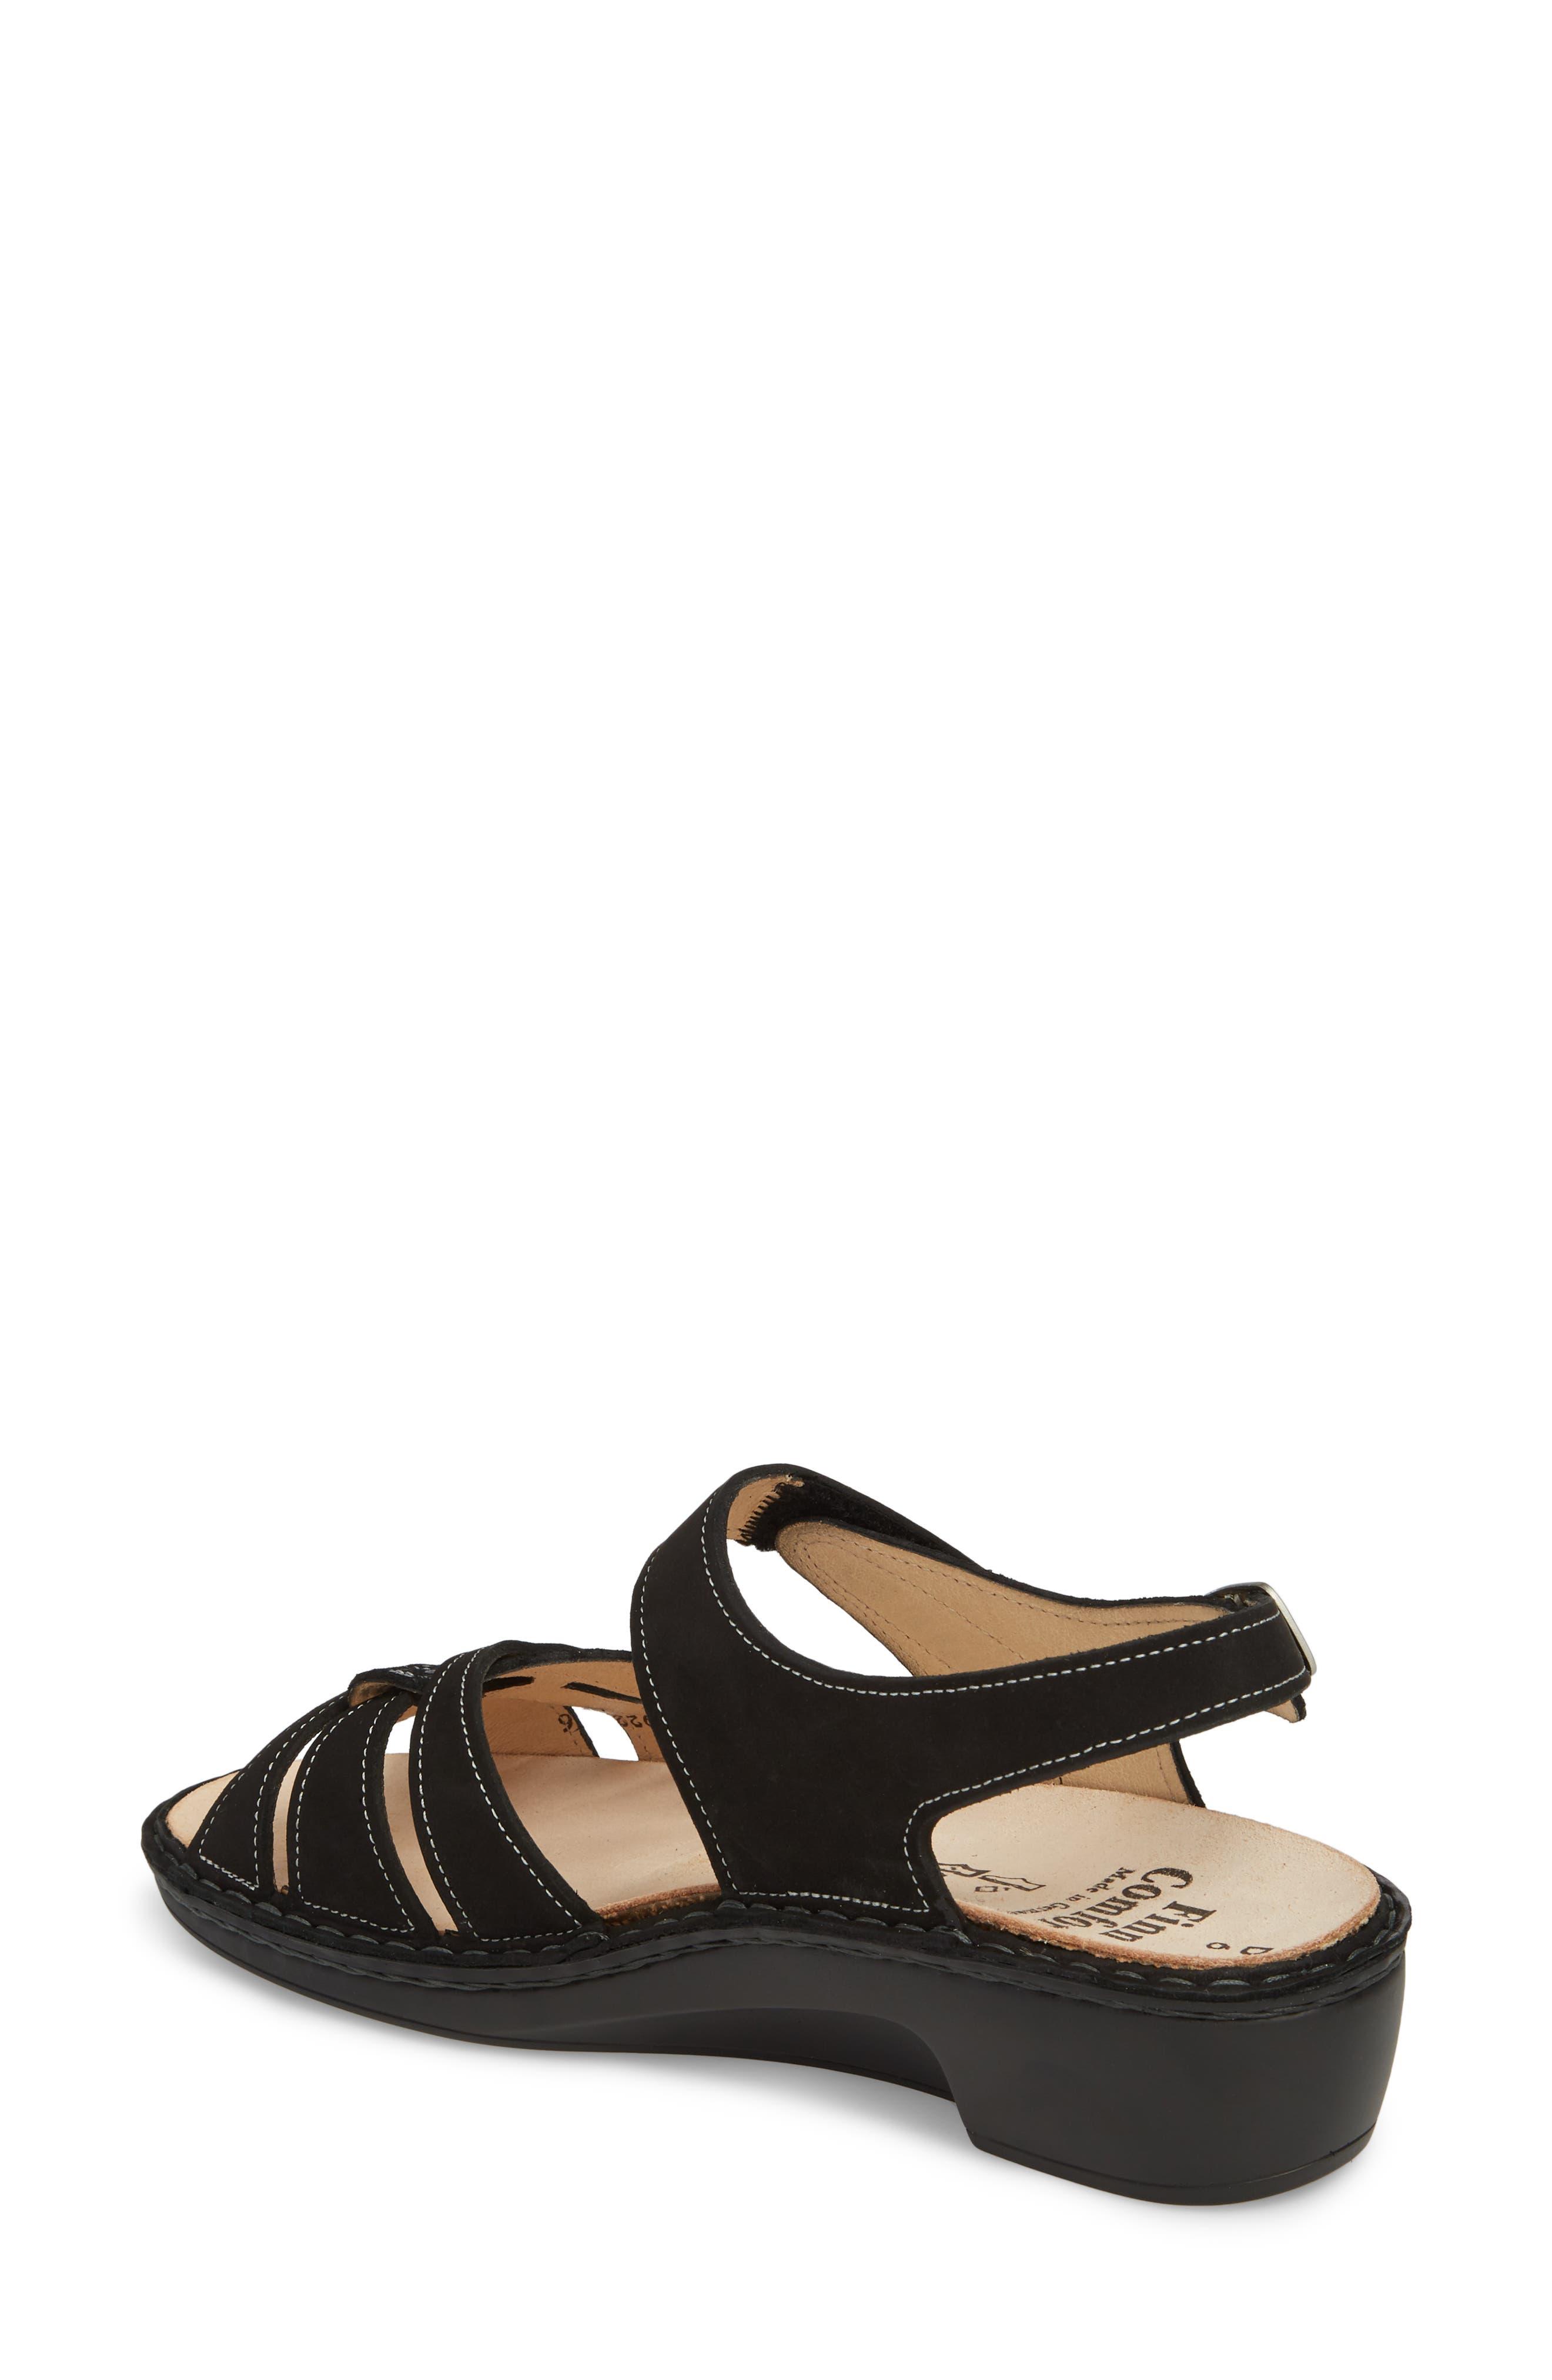 FINN COMFORT, Buka Sandal, Alternate thumbnail 2, color, 001